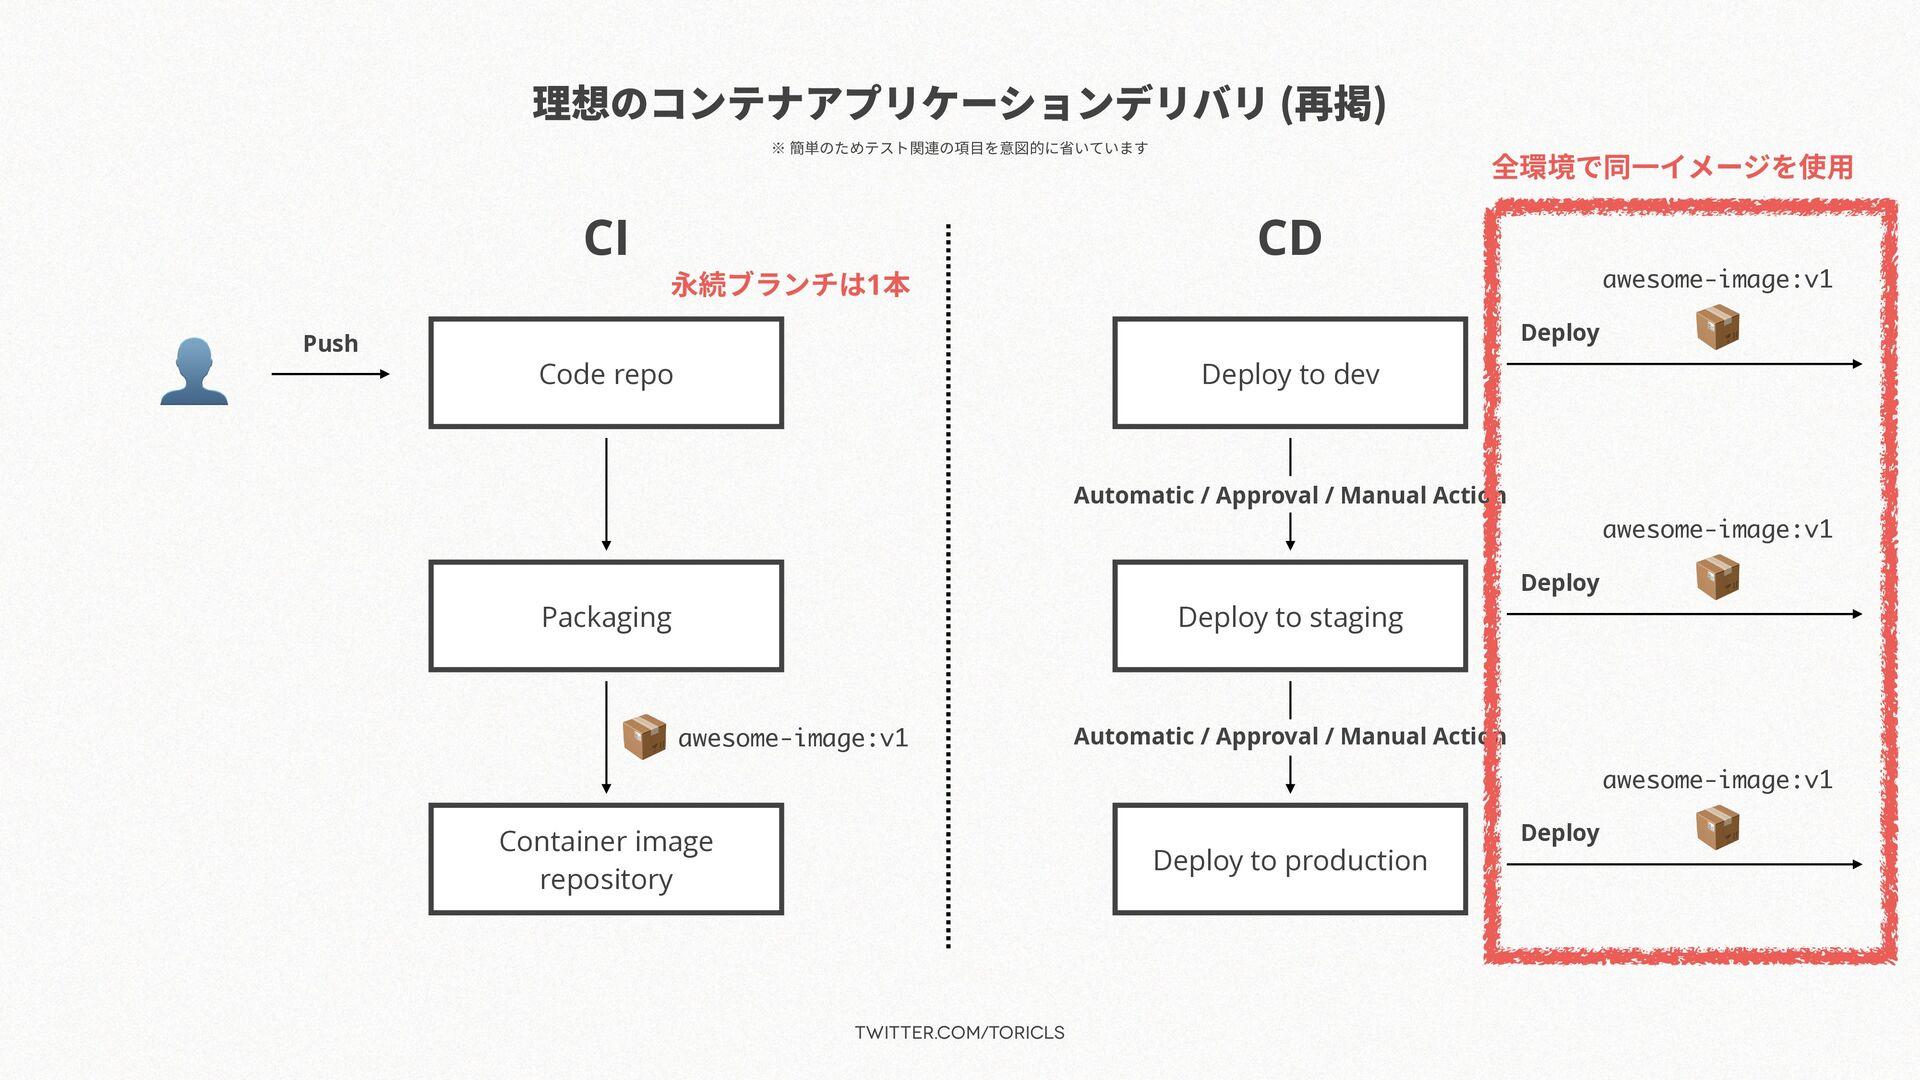 twitter.com/toricls 理想のコンテナアプリケーションデリバリ (再掲) CI...